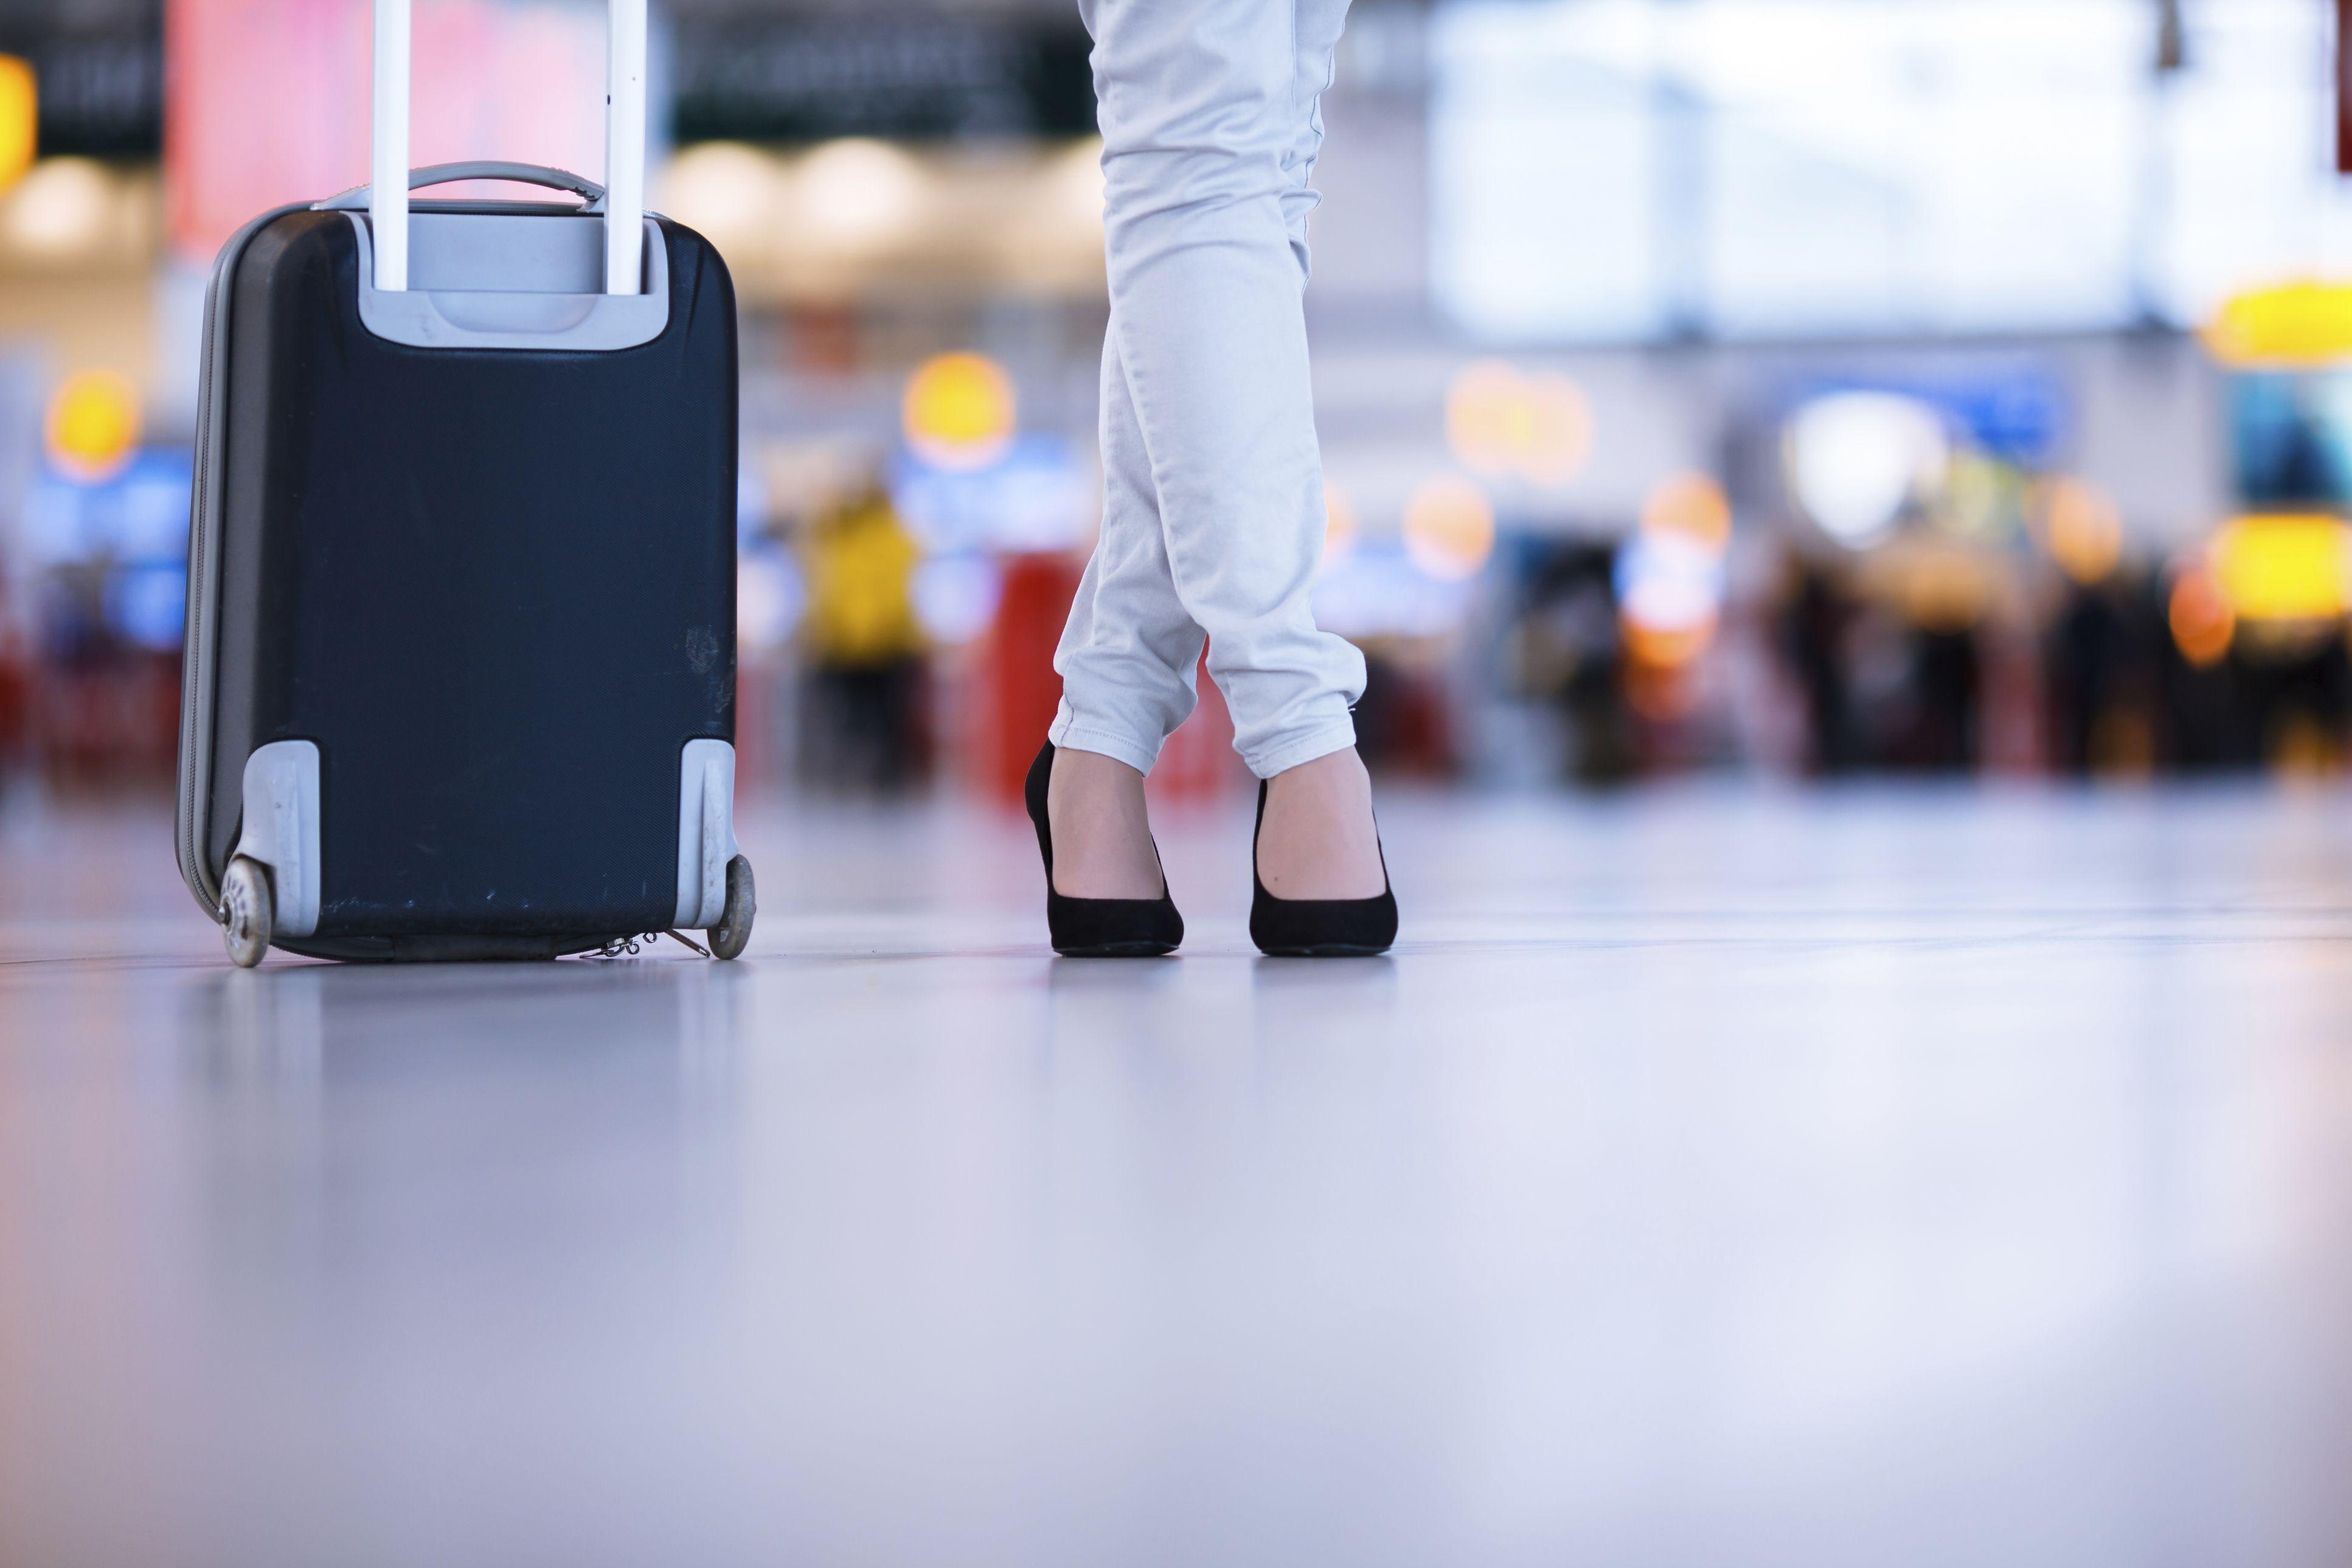 Checking in at Hanover Airport